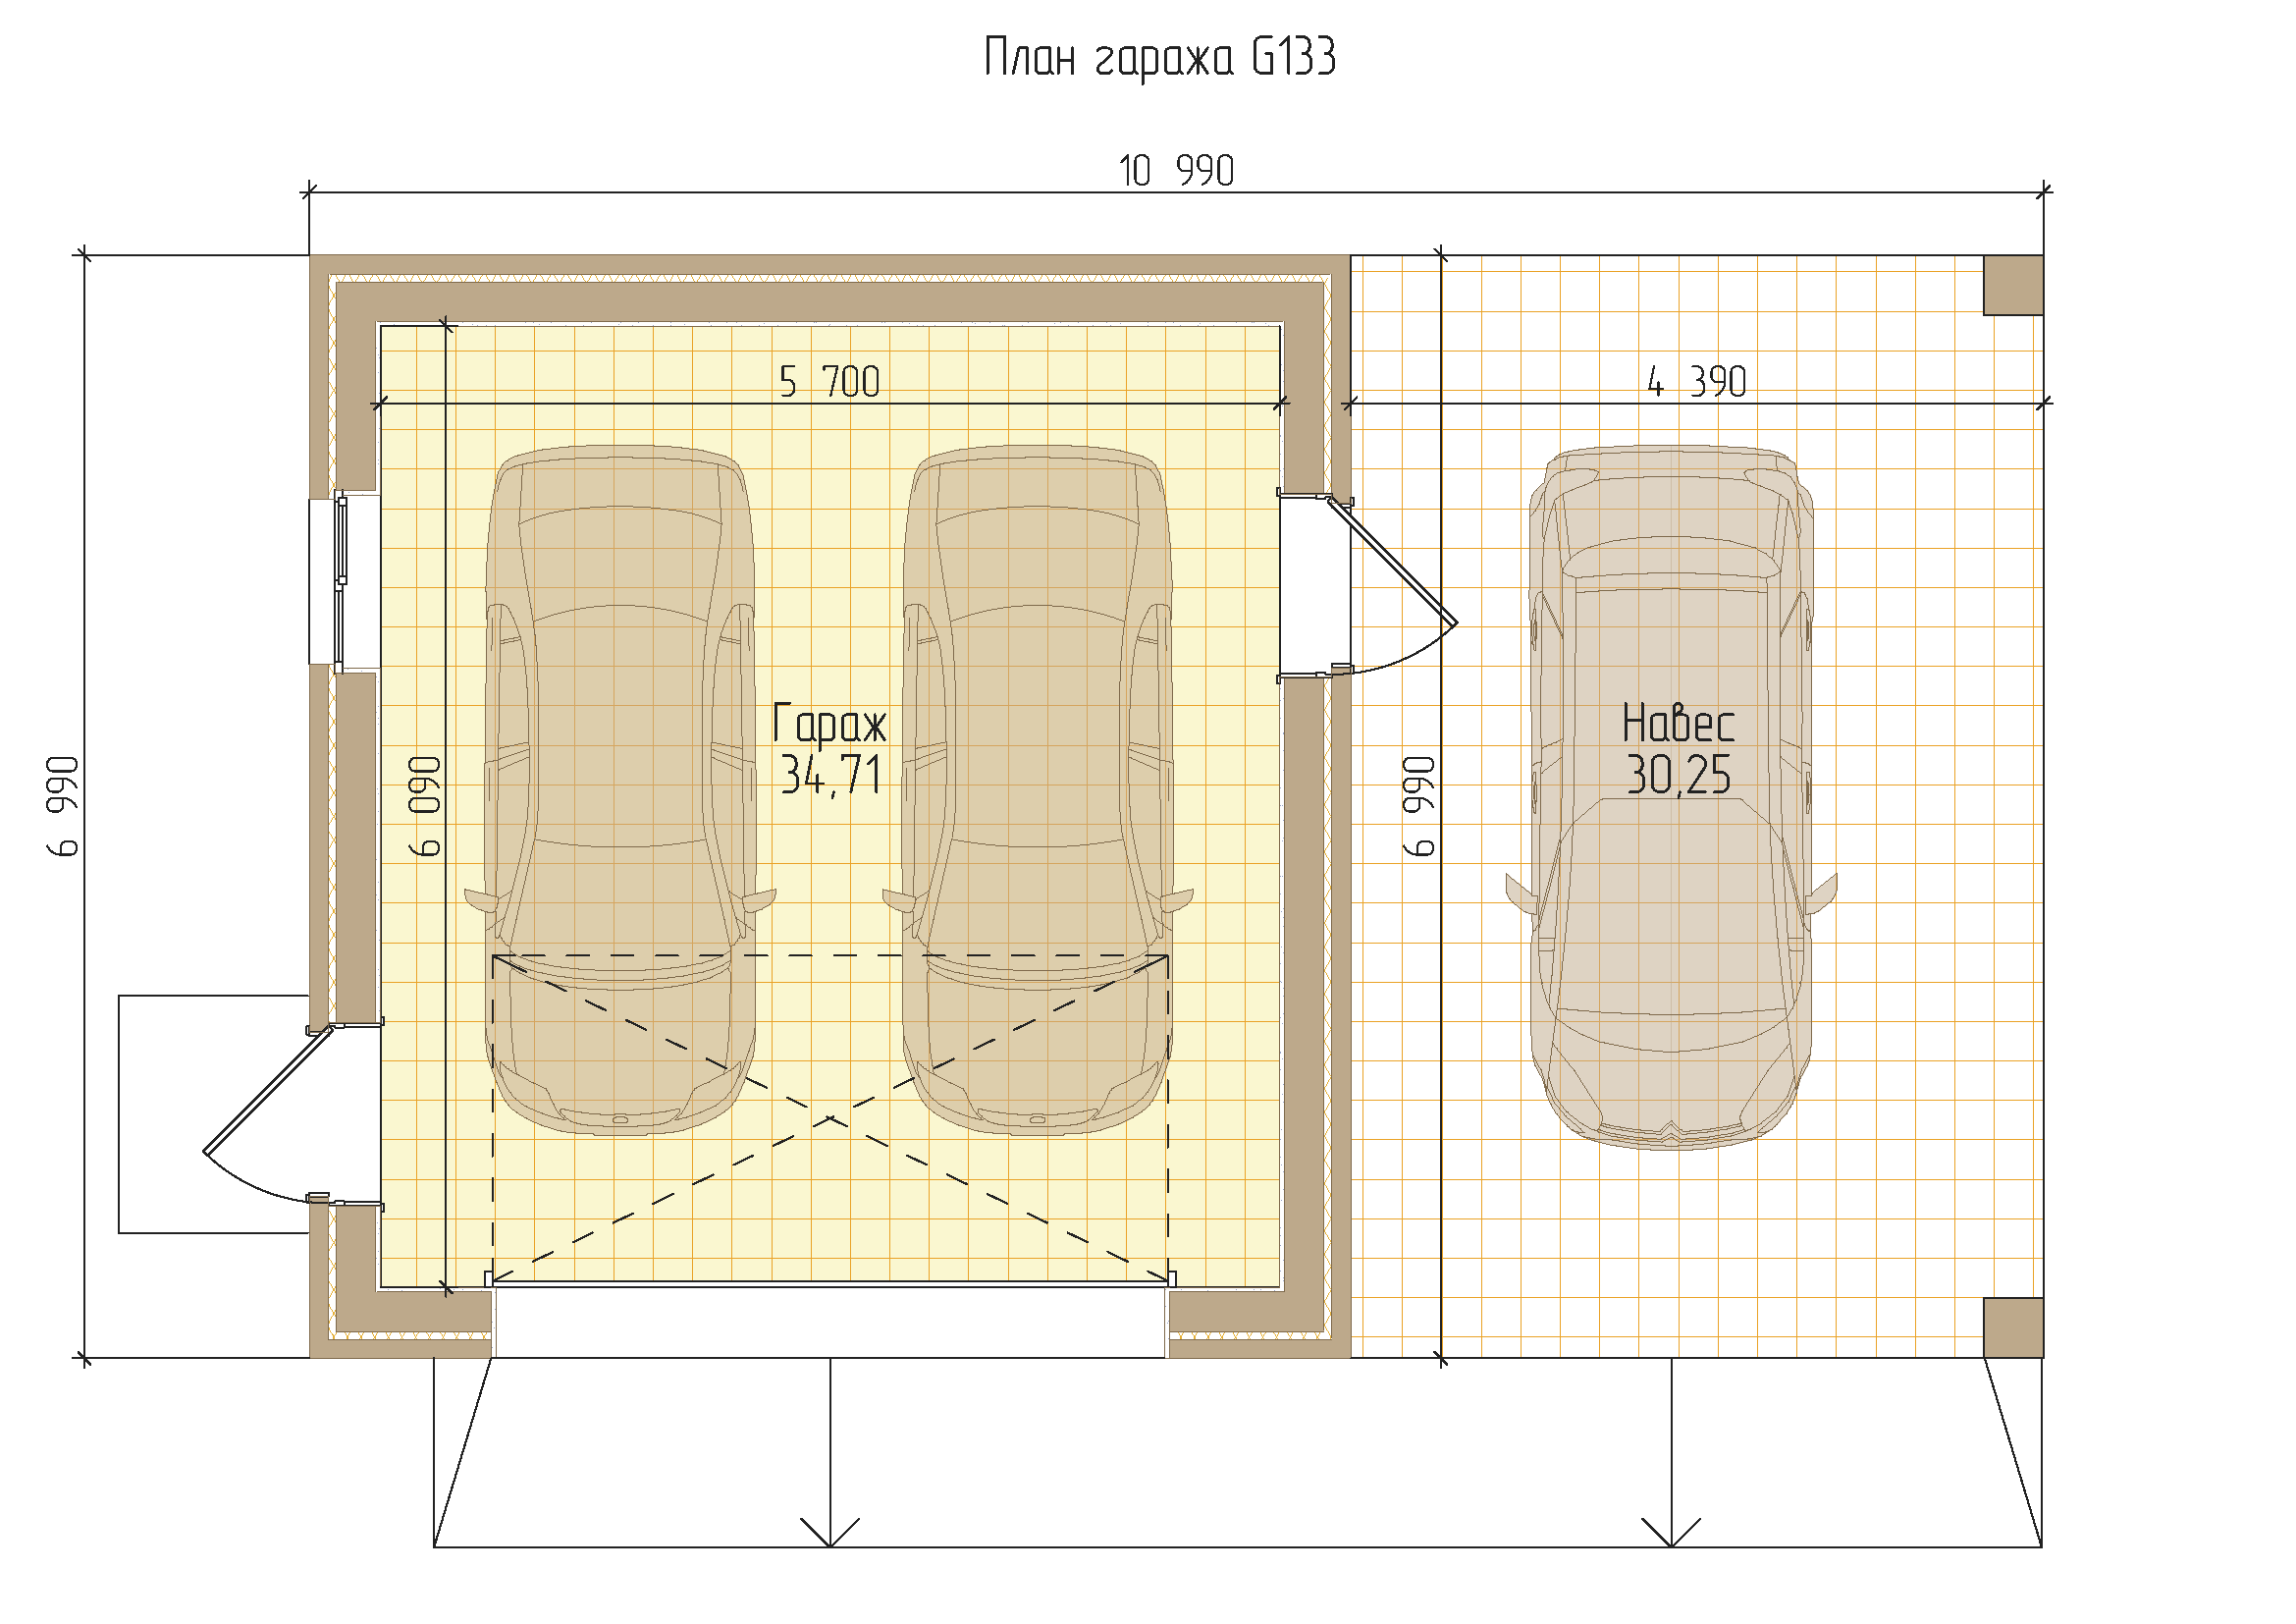 Проект гаража на 3 машины с навесом